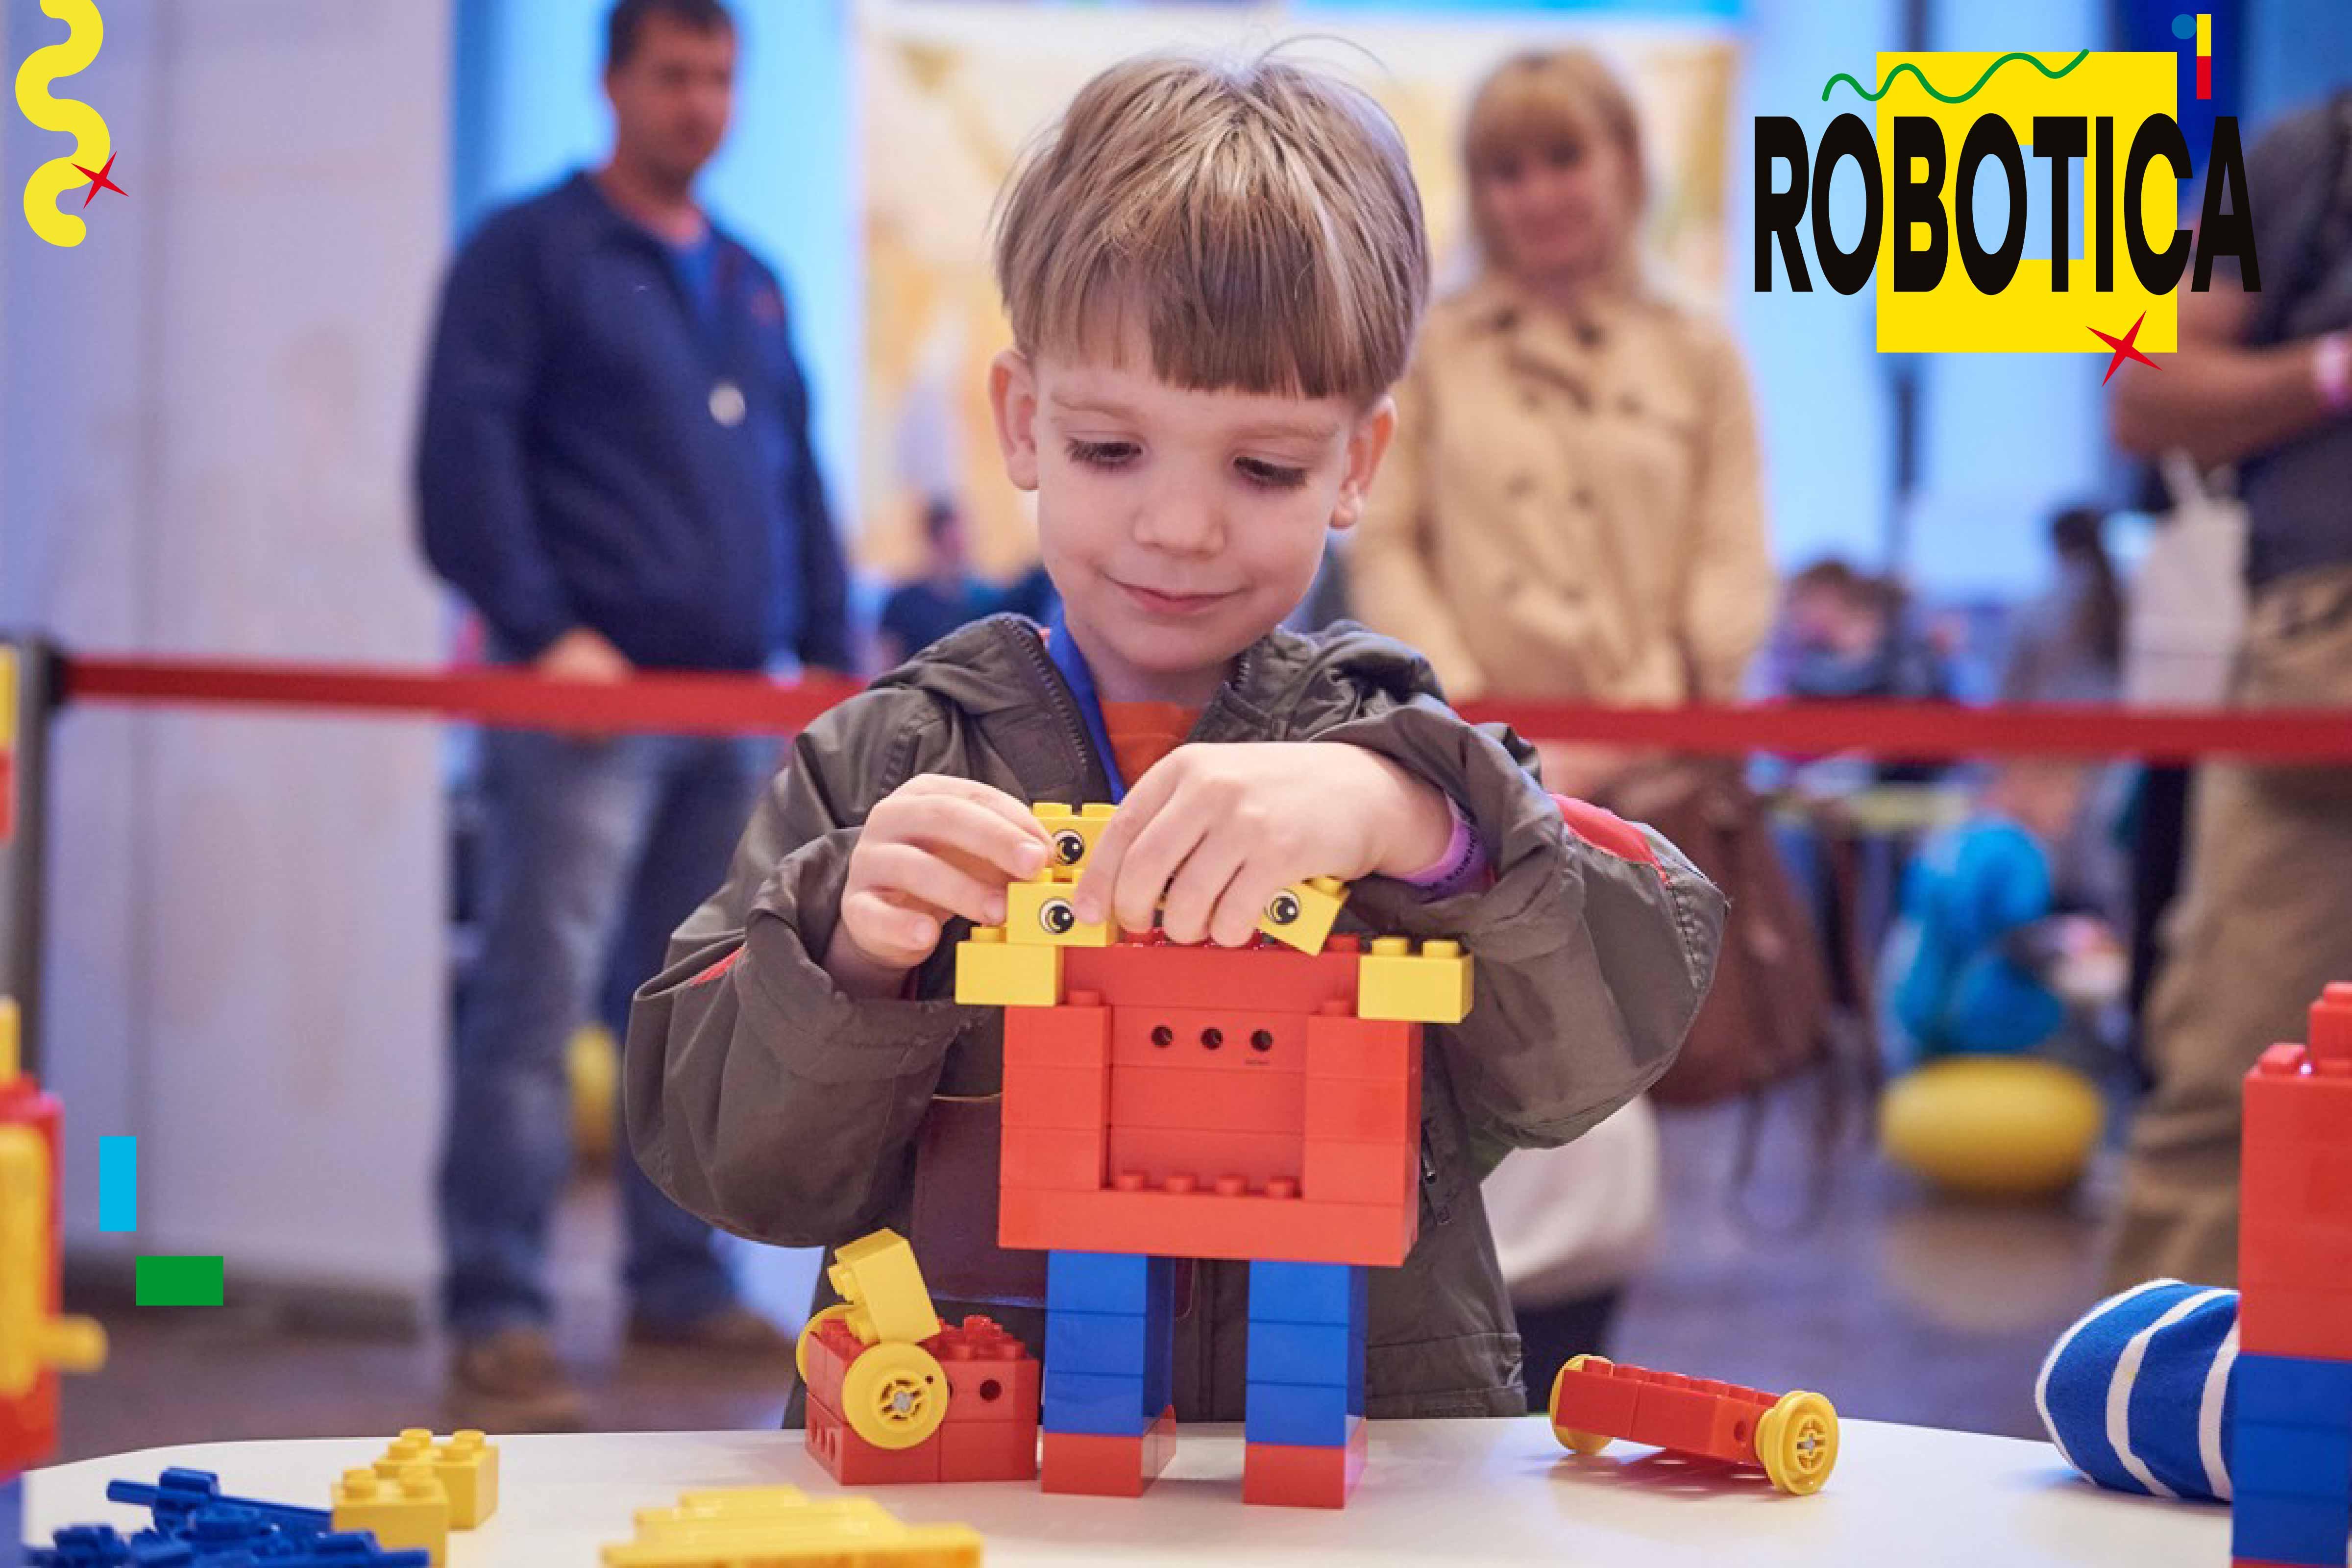 robotica 2019